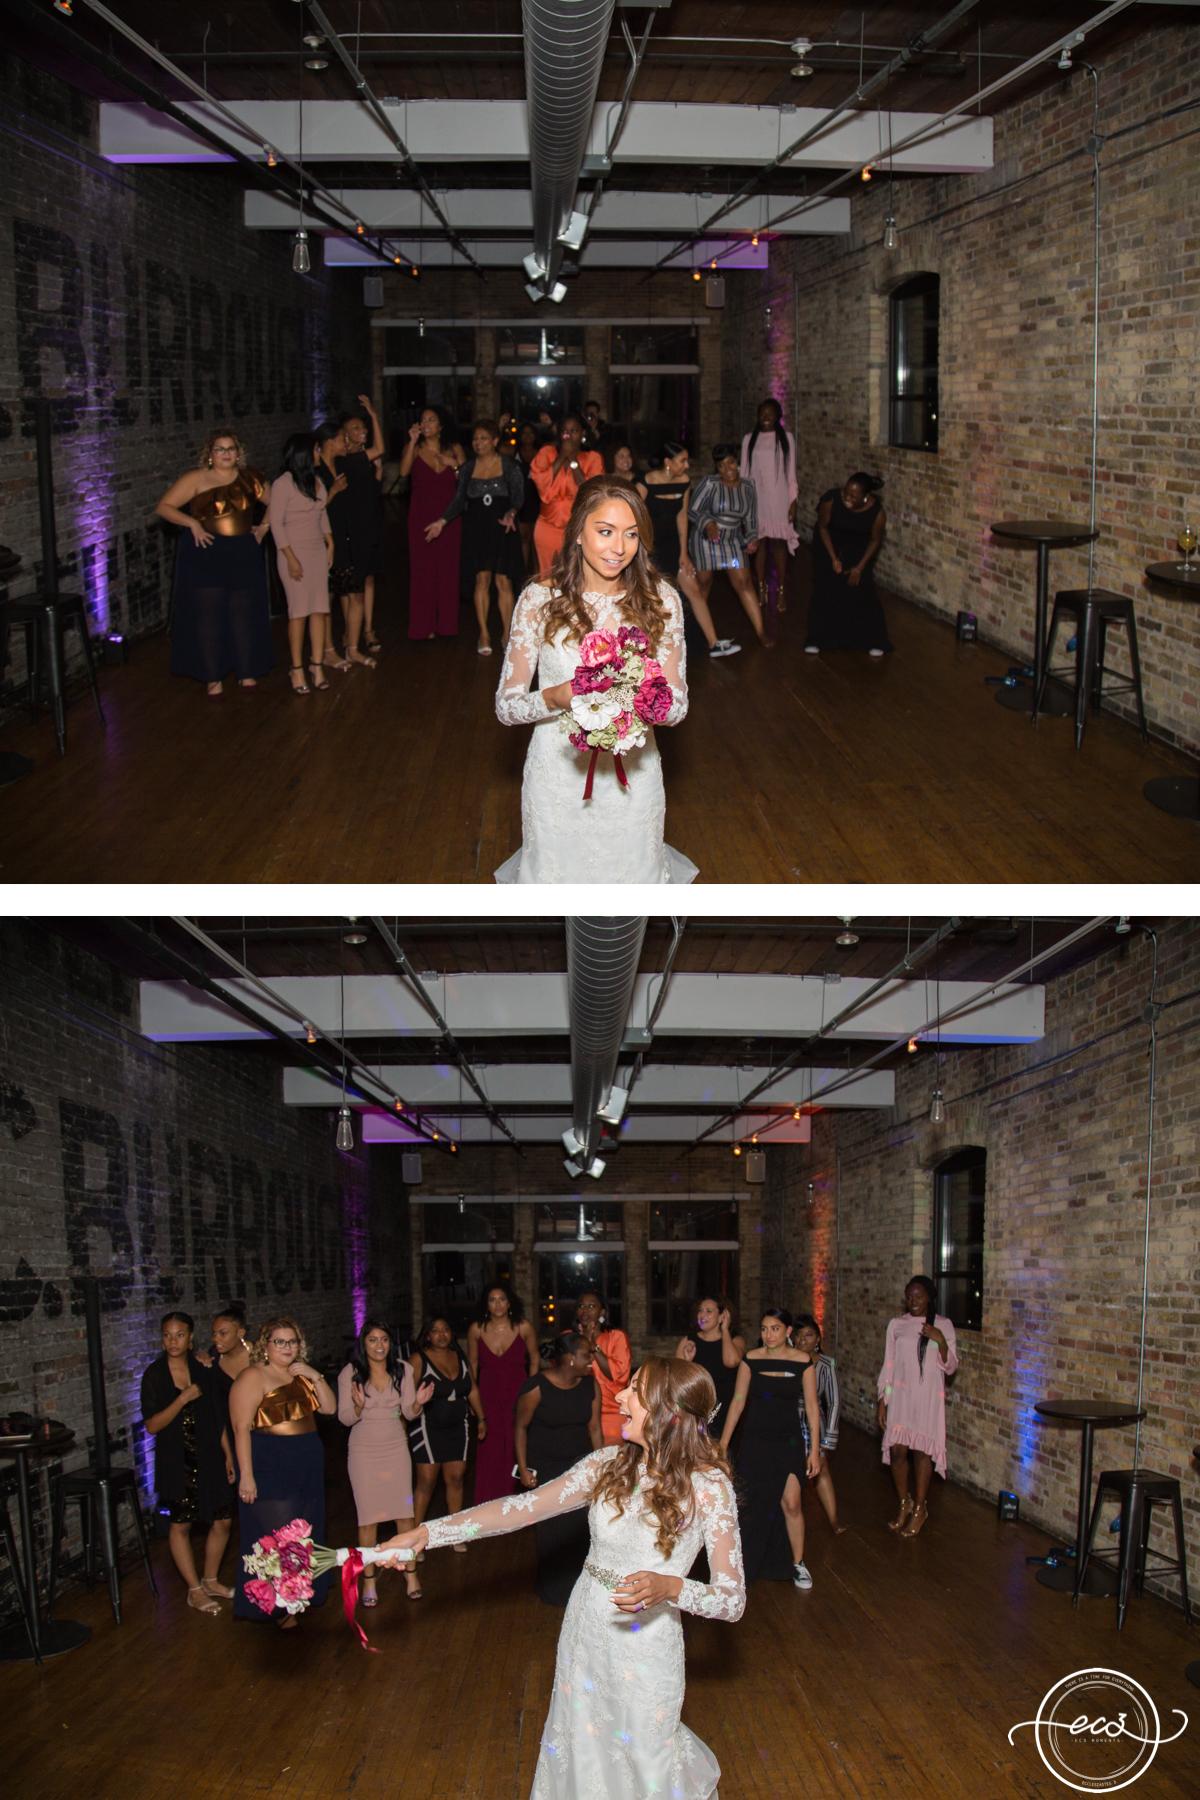 AA-Rustic-Toronto-Burroughes-Wedding55.jpg